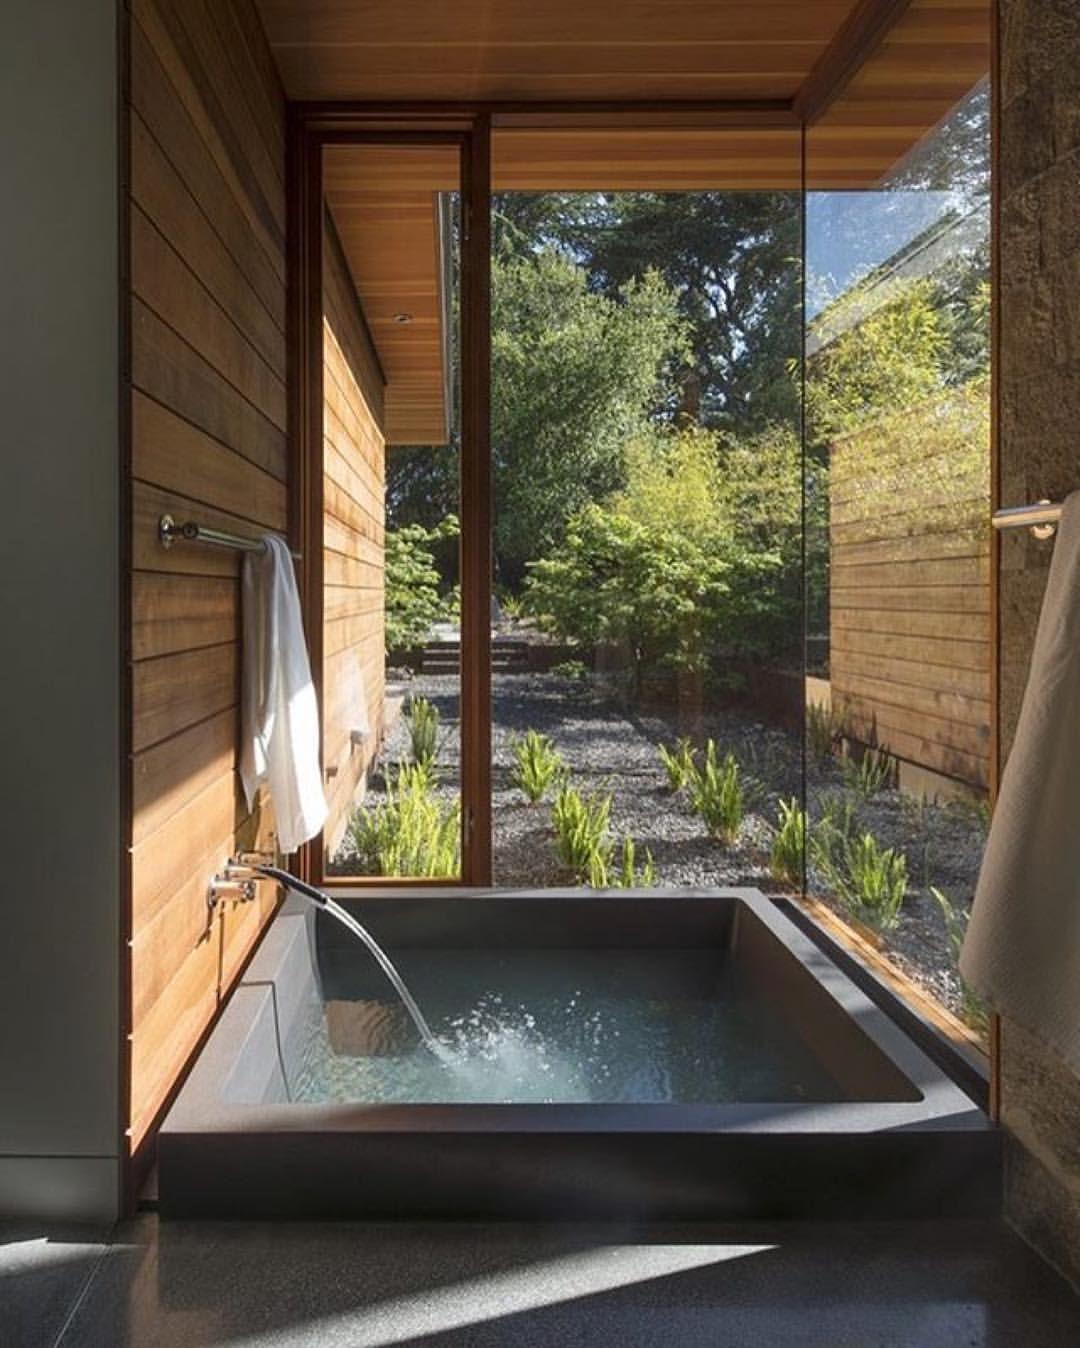 3358 Likerklikk 16 Kommentarer Interior Design Architecture Modern Interiordesign P Instagram